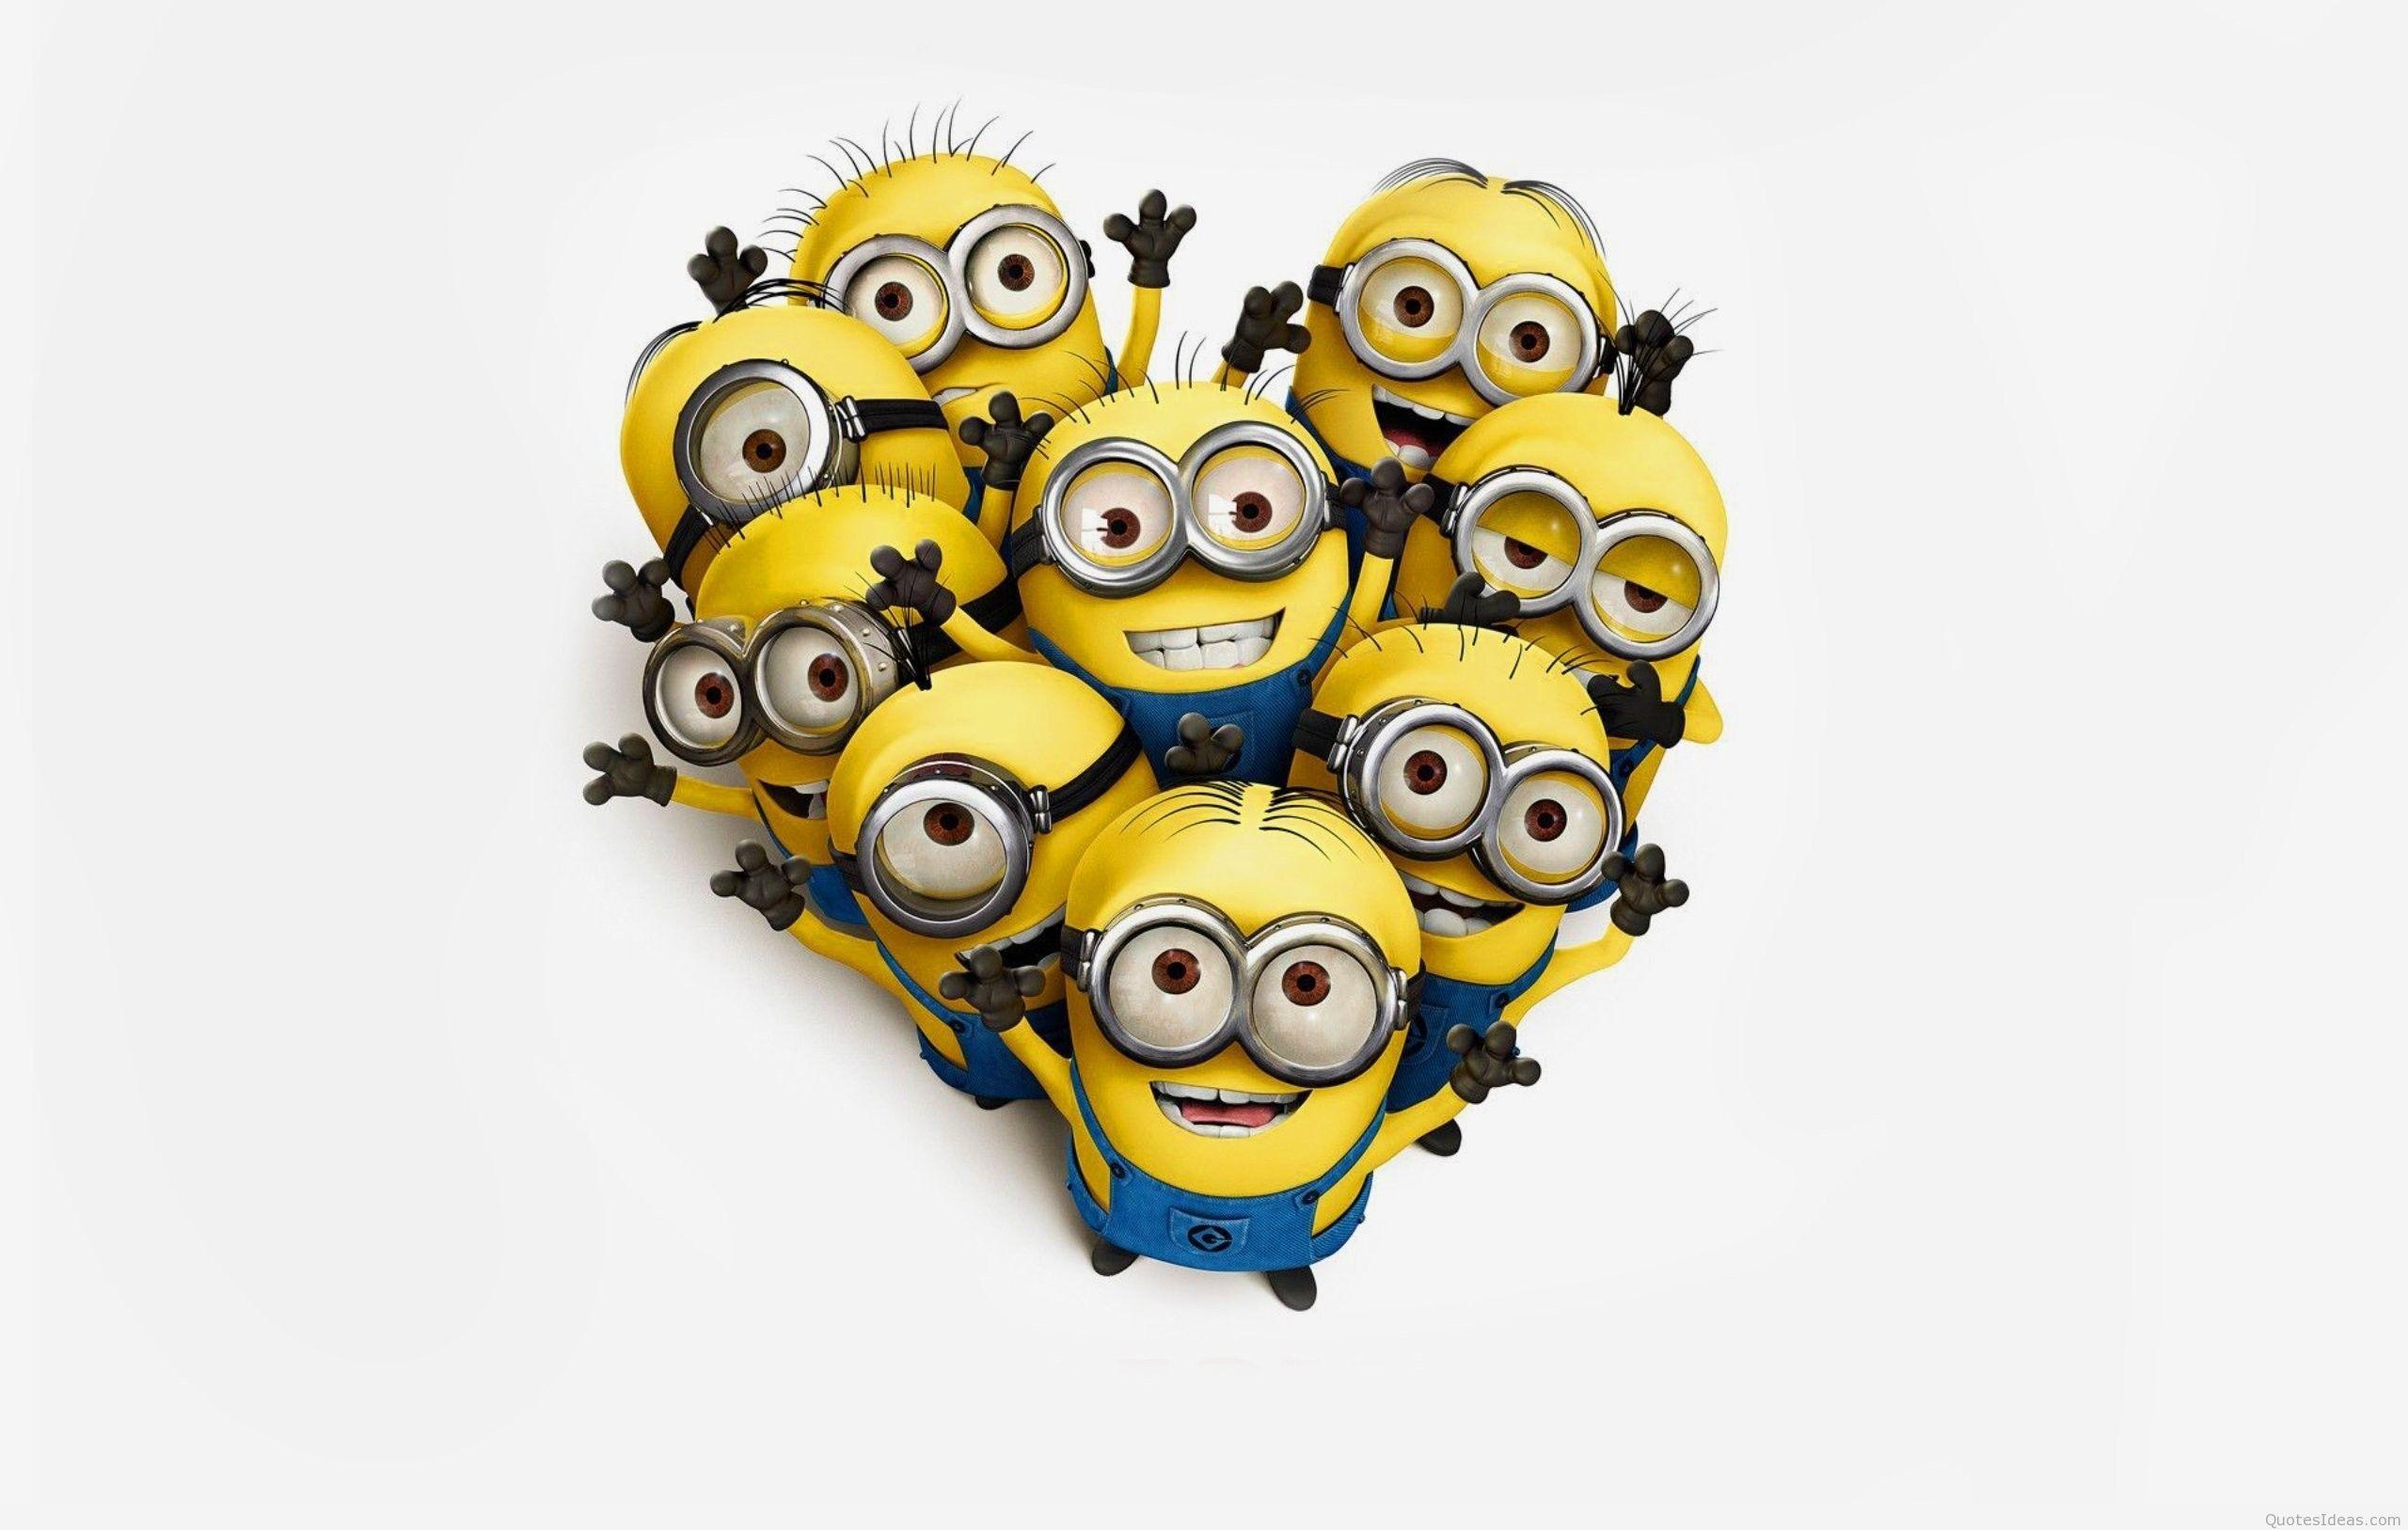 … minion-love-cartoon-hd-wallpaper-2560×1600-6142 …